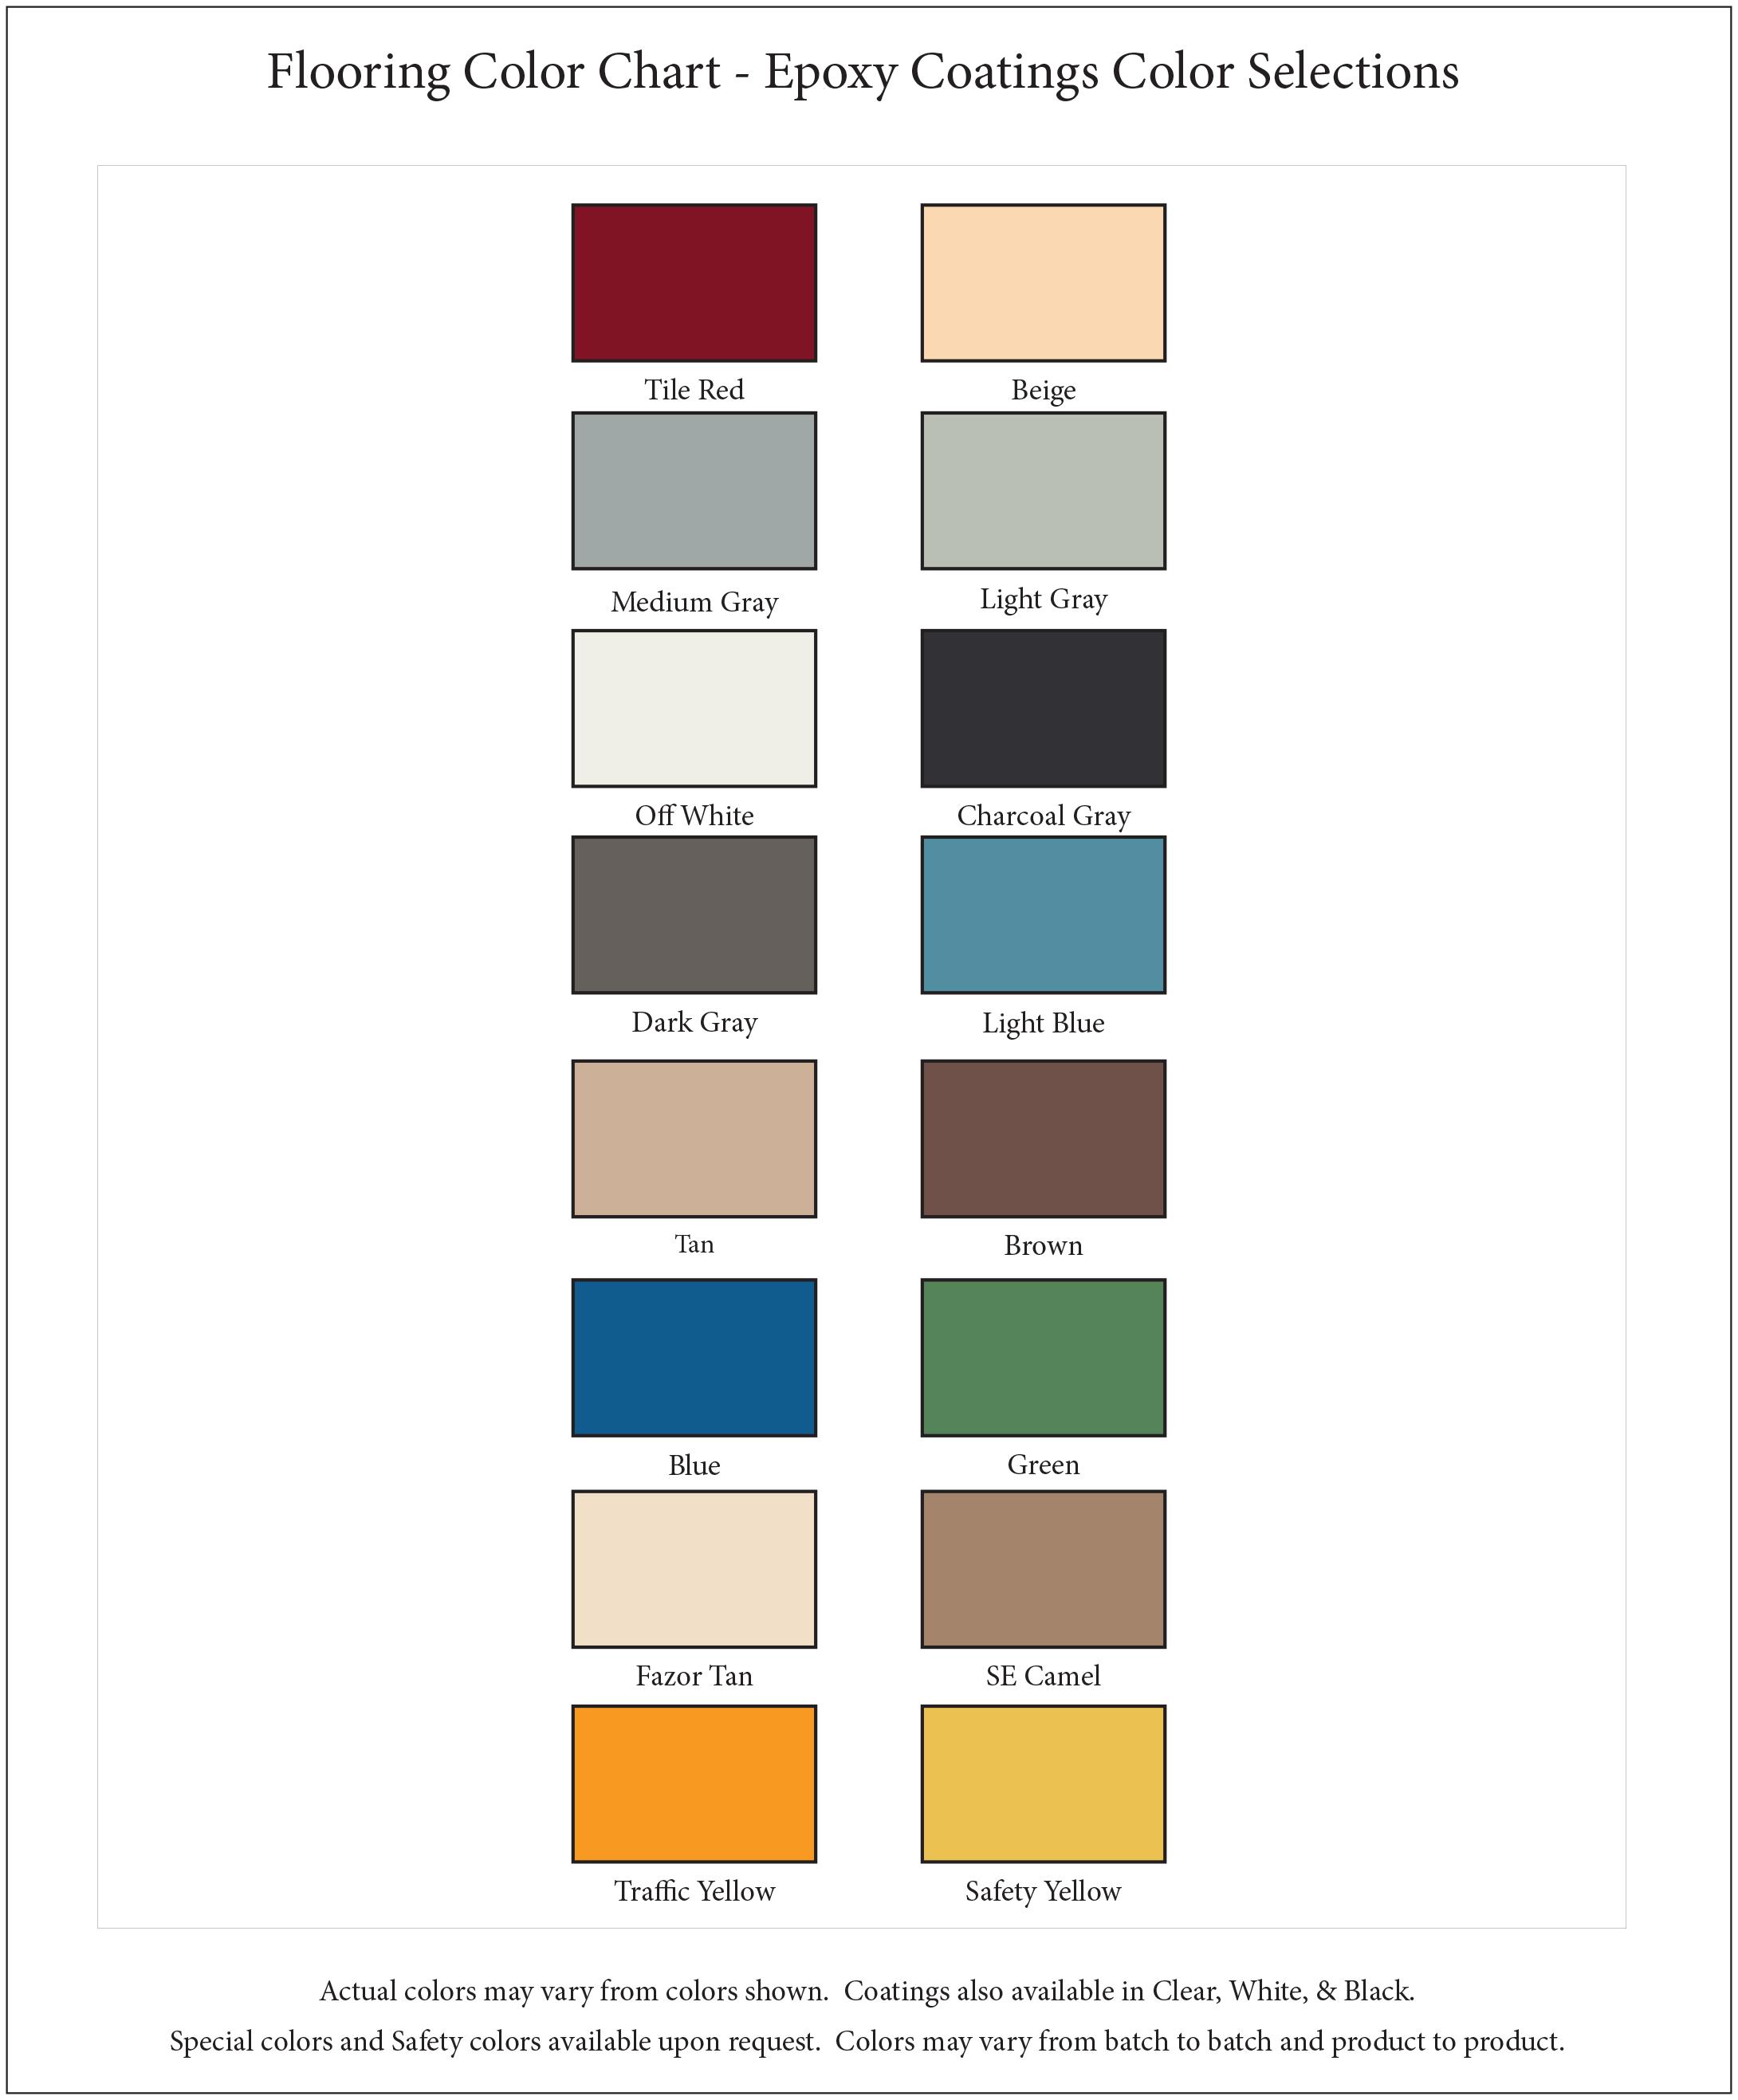 https://www.vseal.com/media/catalog/product/cache/1/image/9df78eab33525d08d6e5fb8d27136e95/i/n/industra-coat_color_chart.png